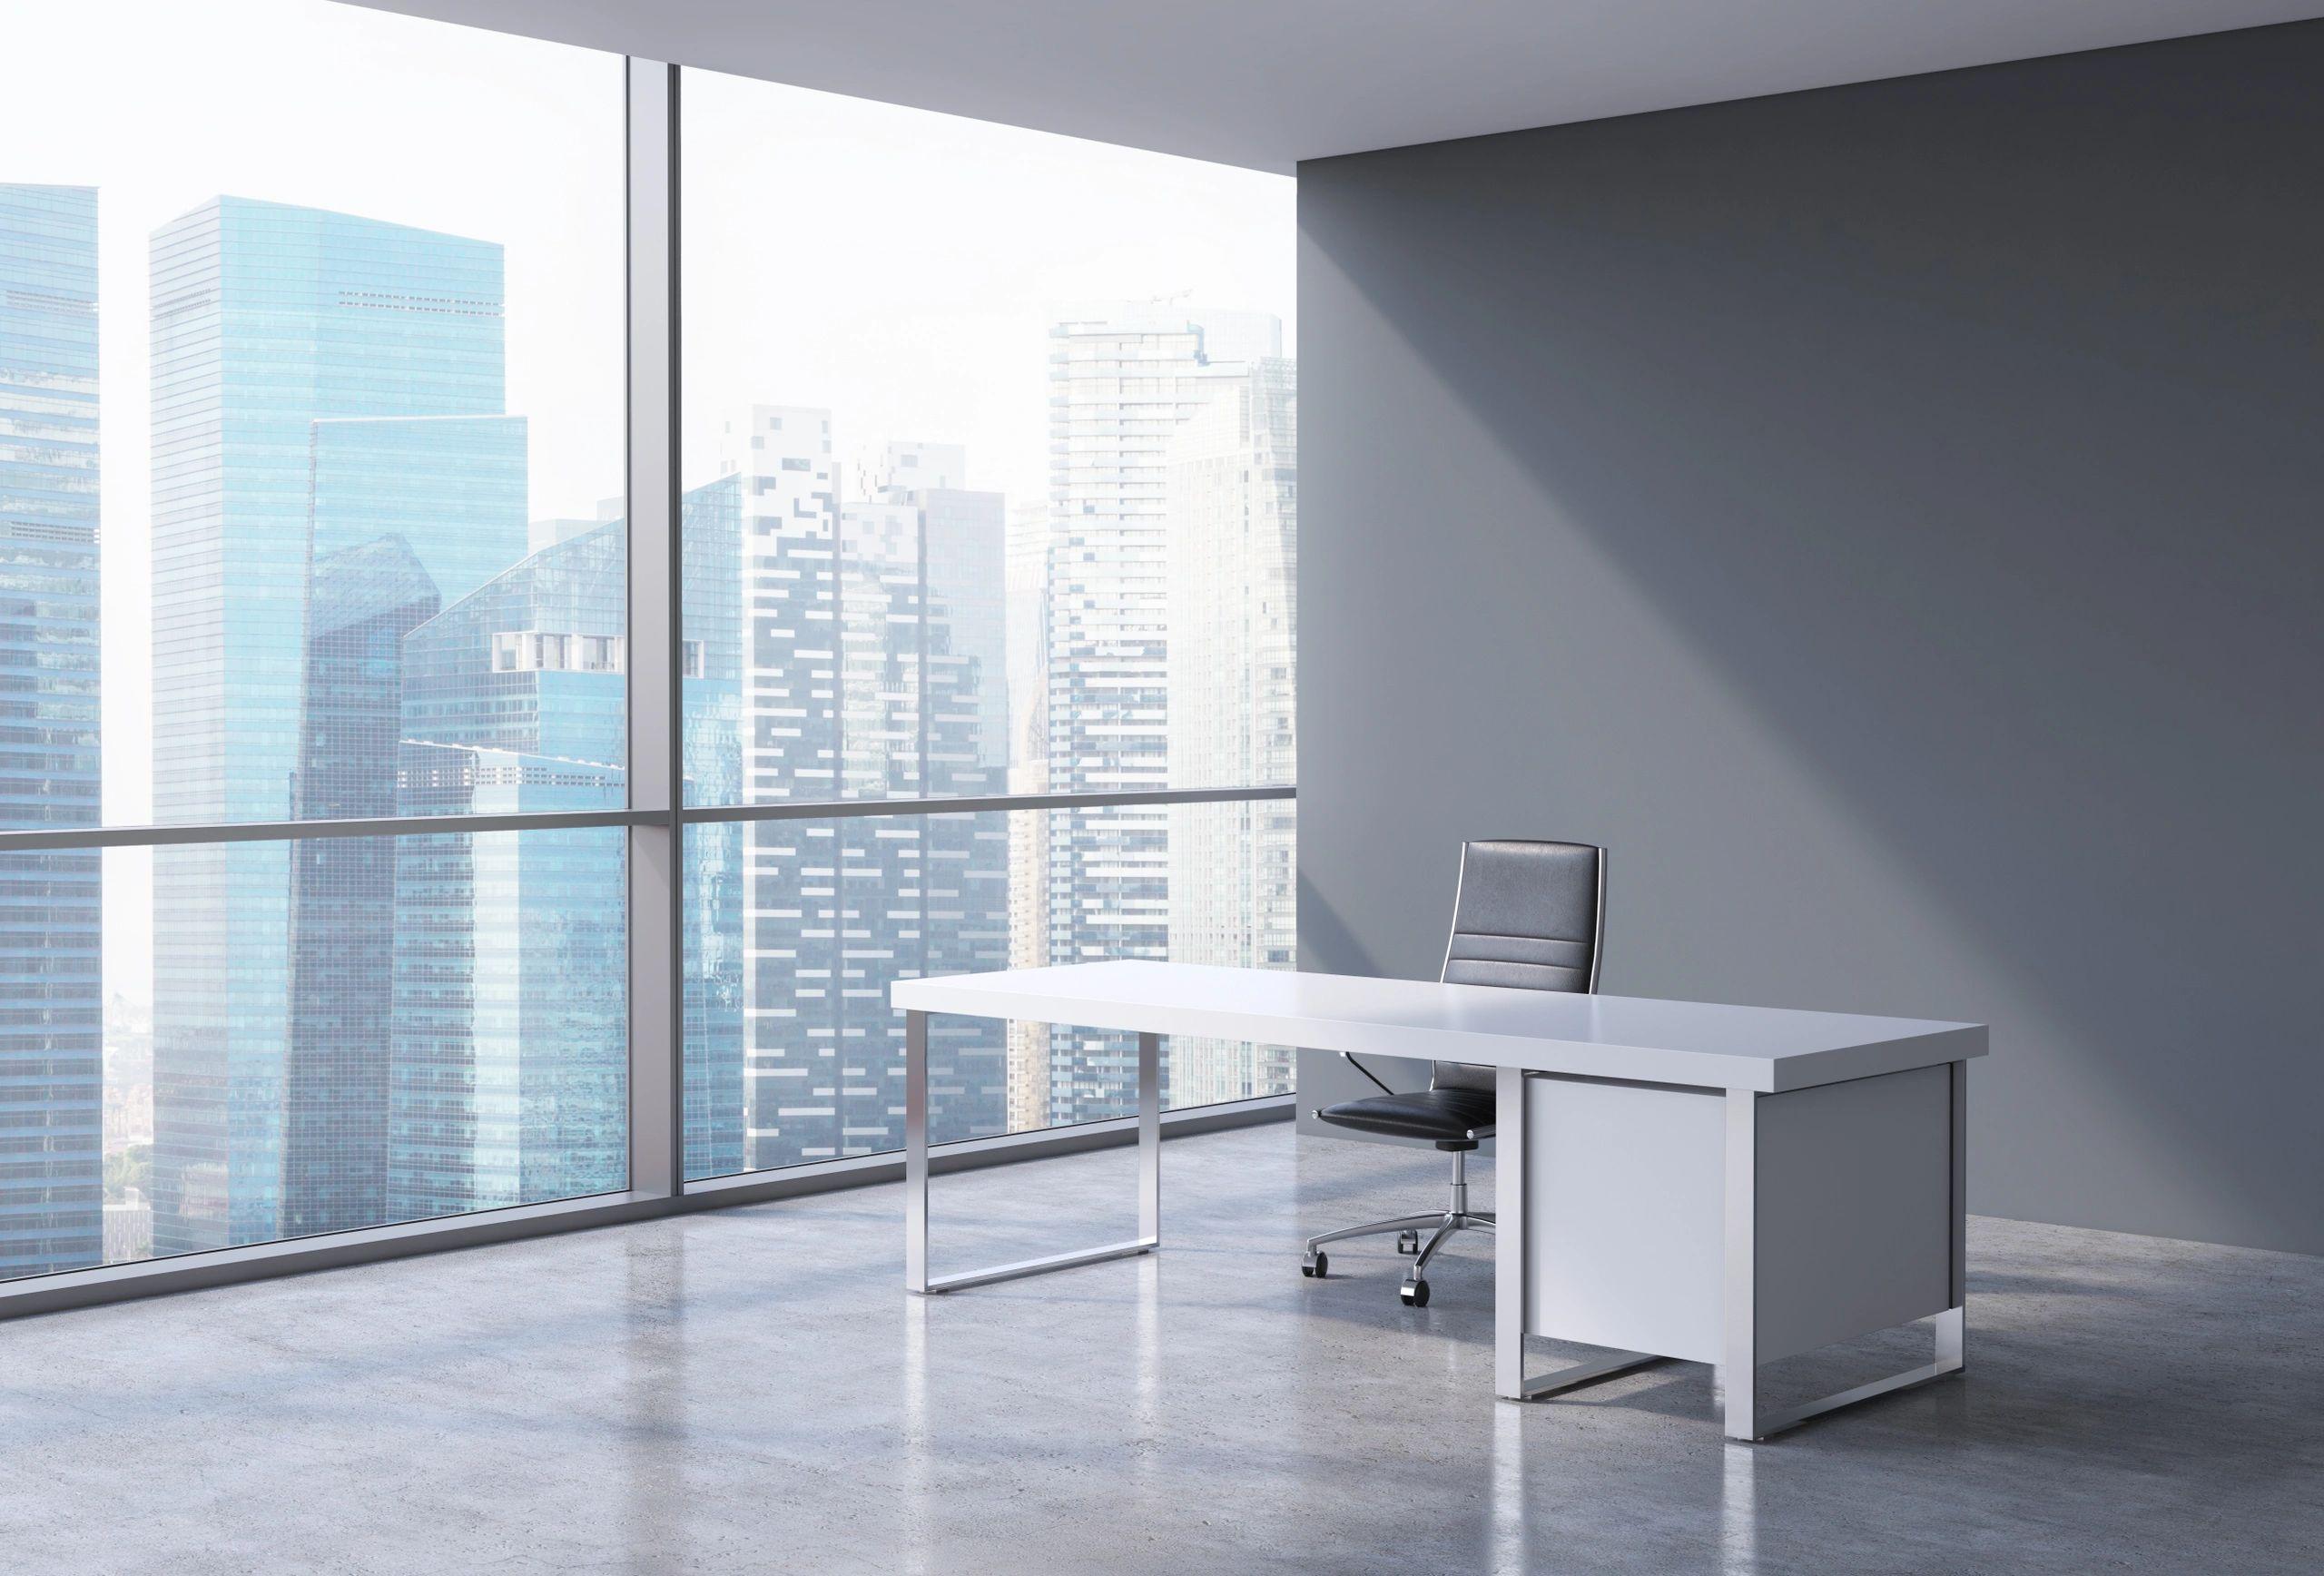 Superb Officexperts Office Furniture Installation Office Download Free Architecture Designs Scobabritishbridgeorg